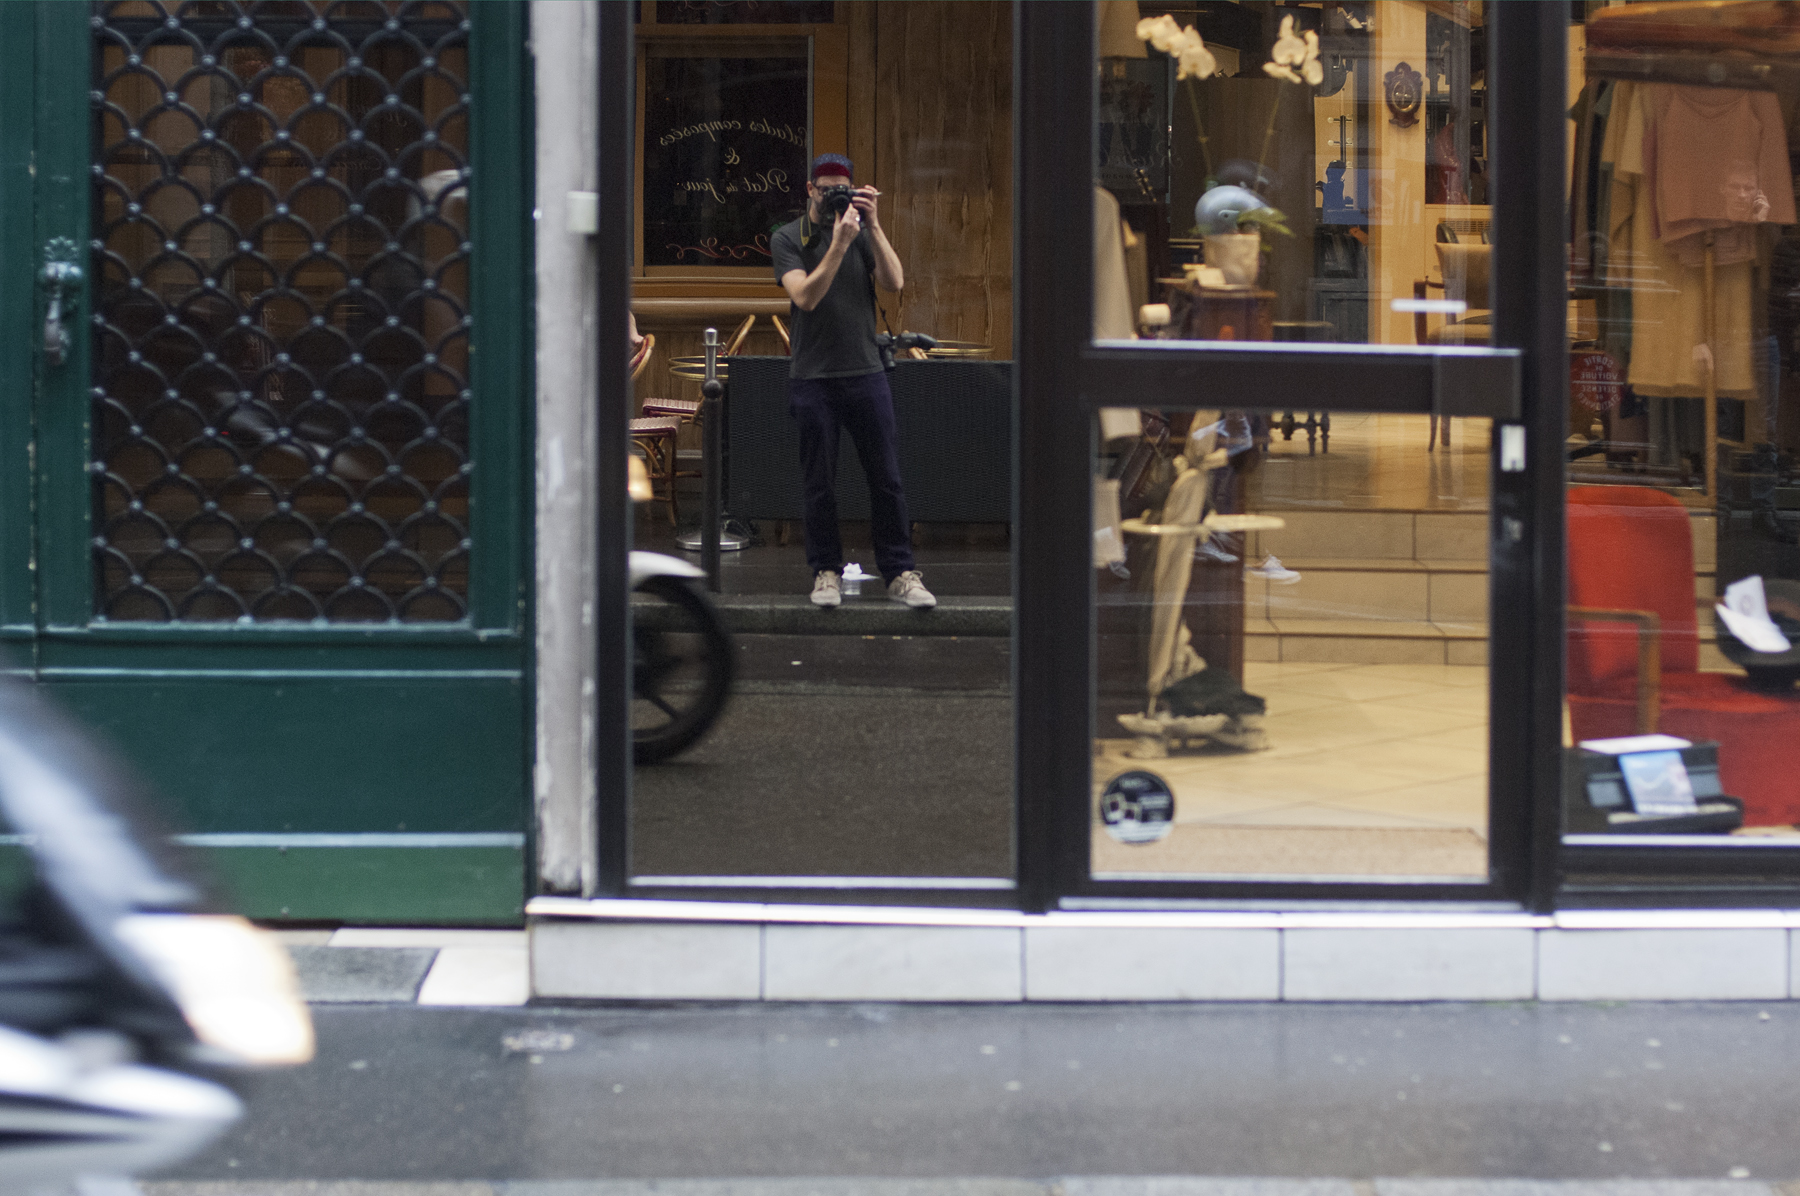 Self-portrait, Rue de Richelieu, November 2014.